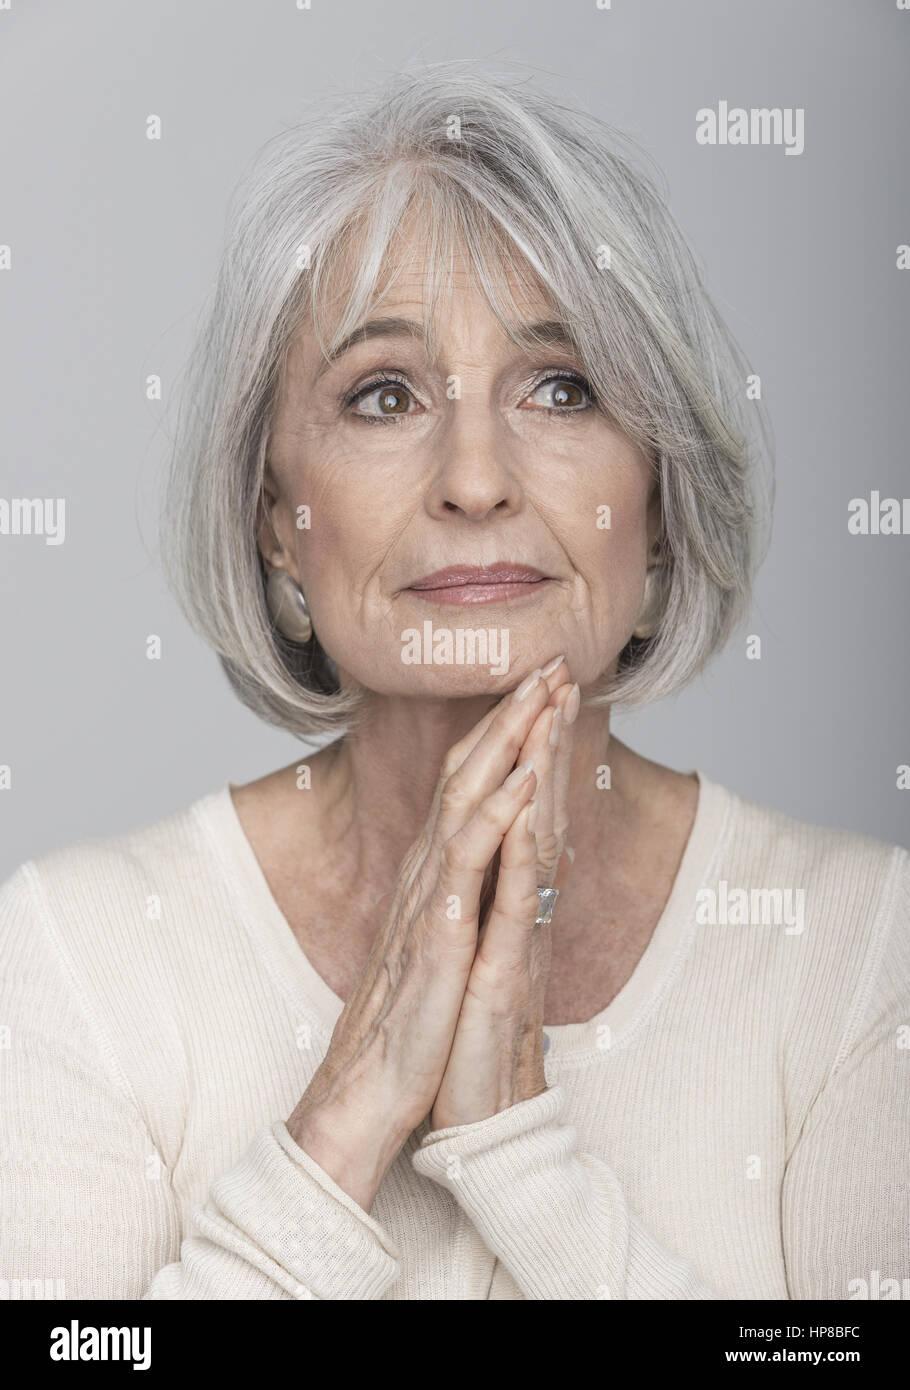 Aeltere Frau mit grauen Haaren, Portraet (model-released